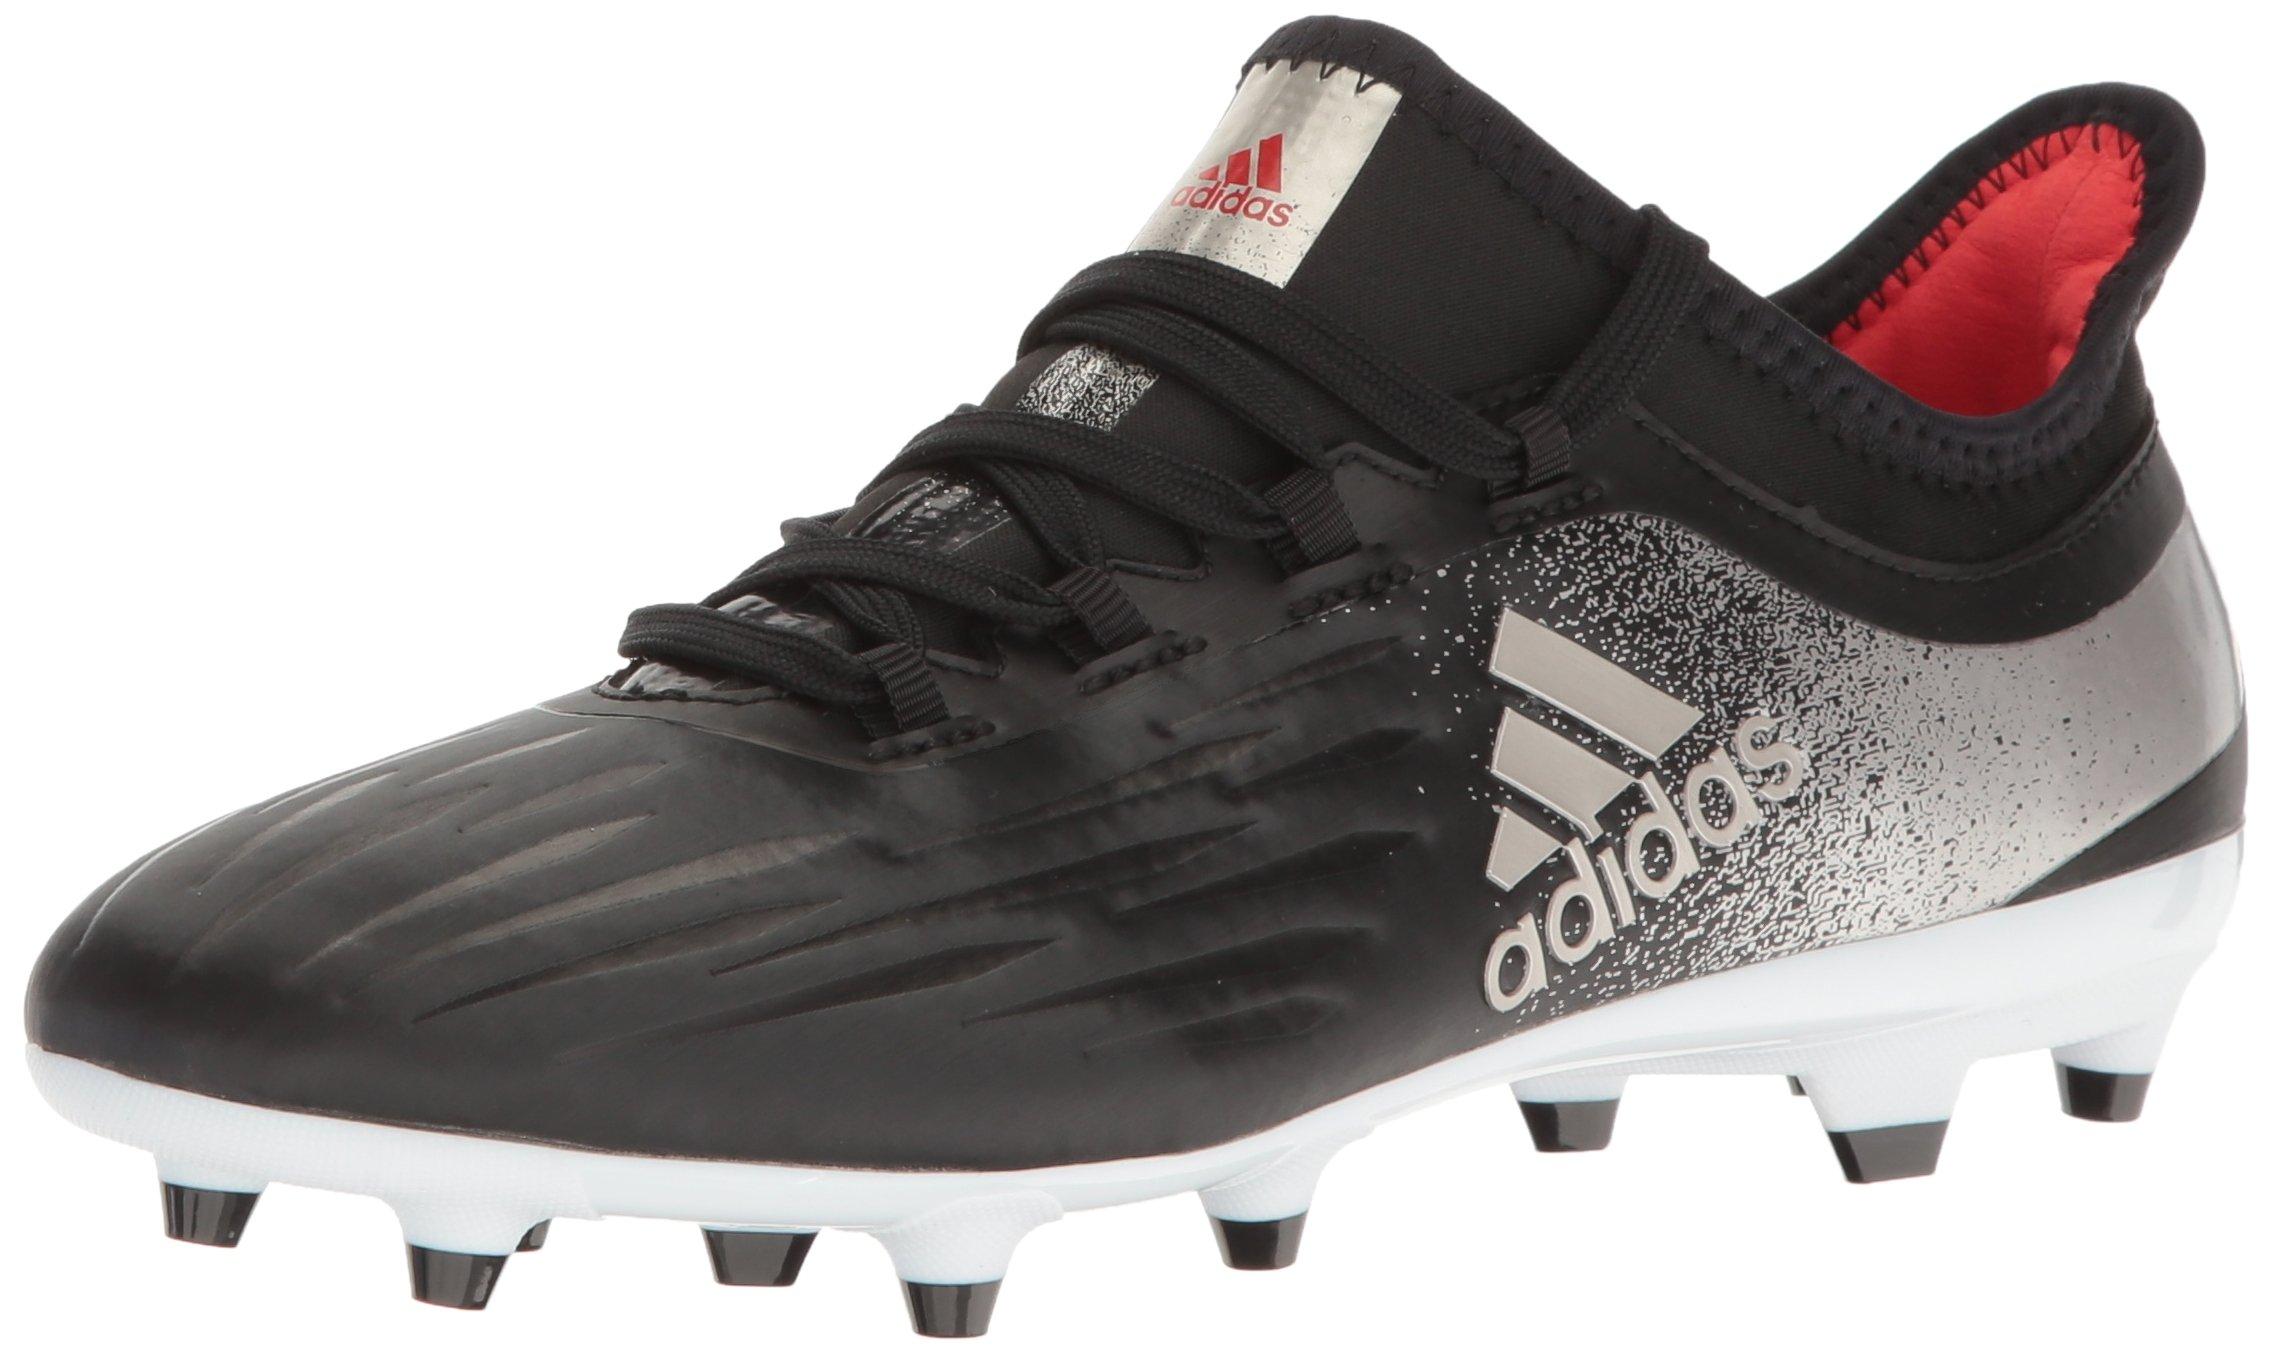 adidas Women's X 17.2 FG W Soccer Shoe, Black/Platino Core Red S, 9 M US